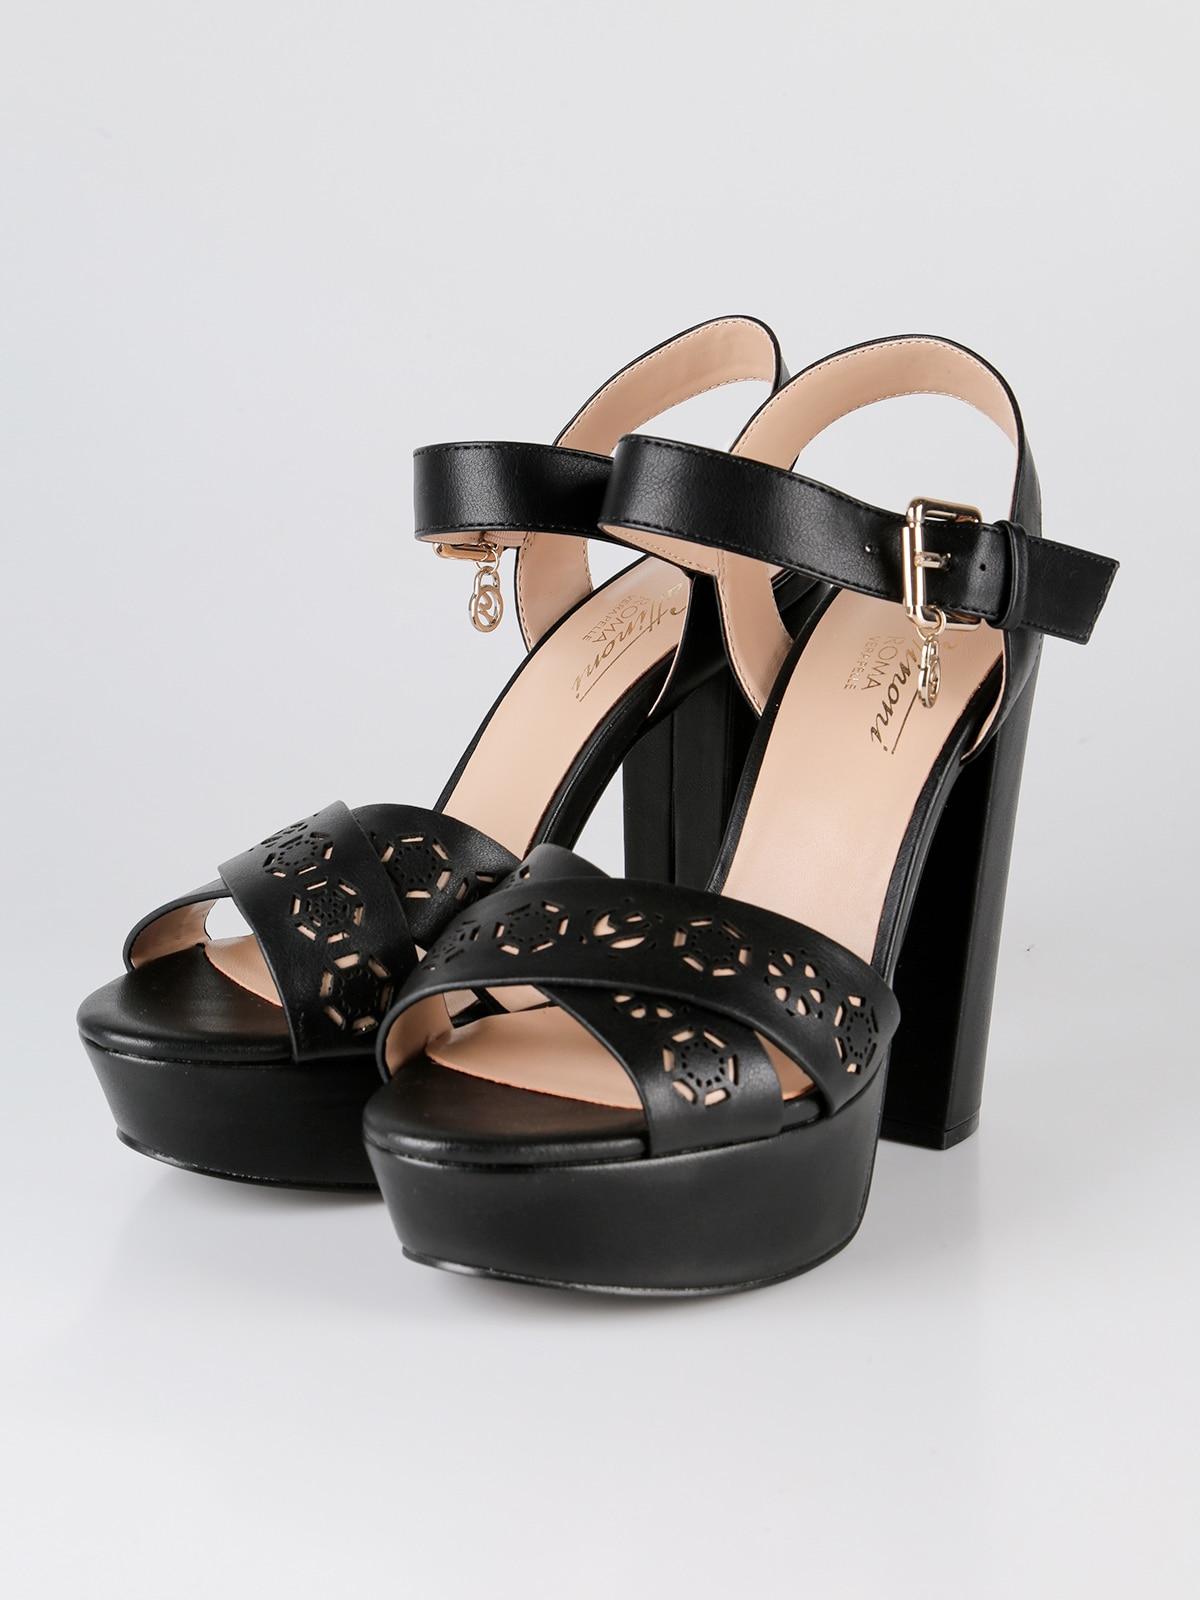 Гаттинони сандалии на блочном каблуке и платформе ламинированное серебро - 2